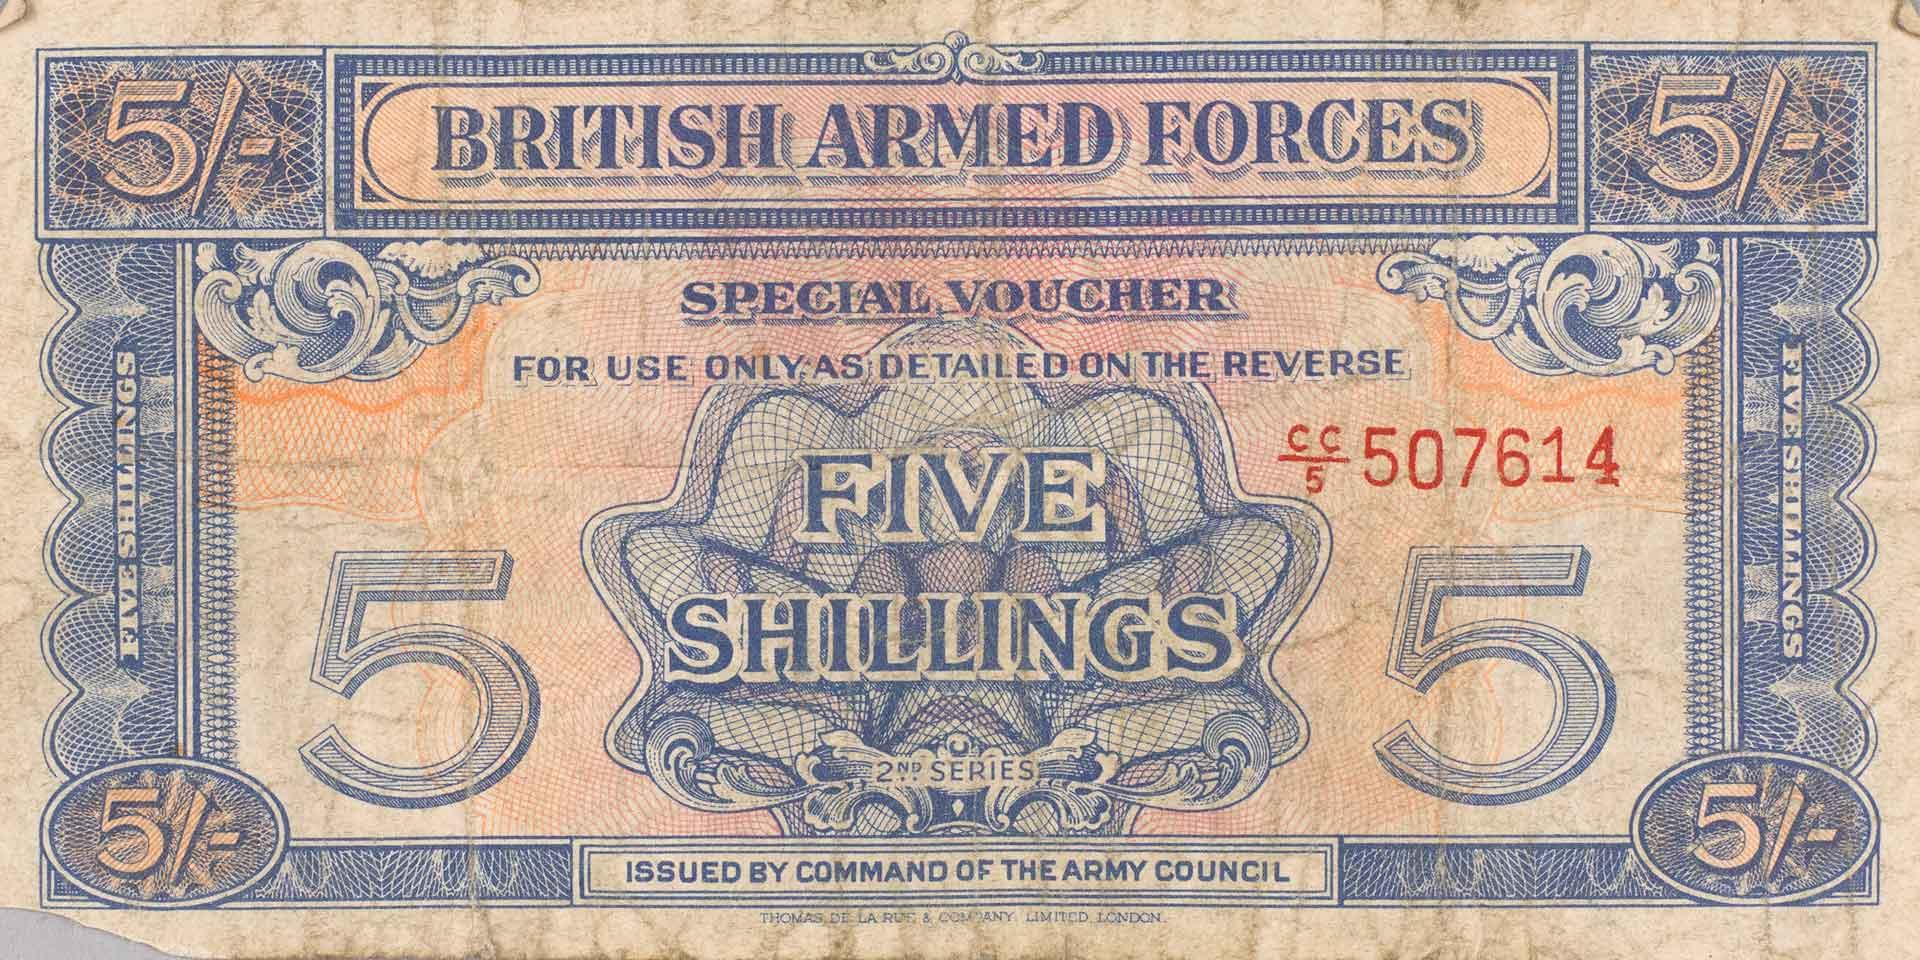 5 Shilling British Armed Forces Voucher, 1948